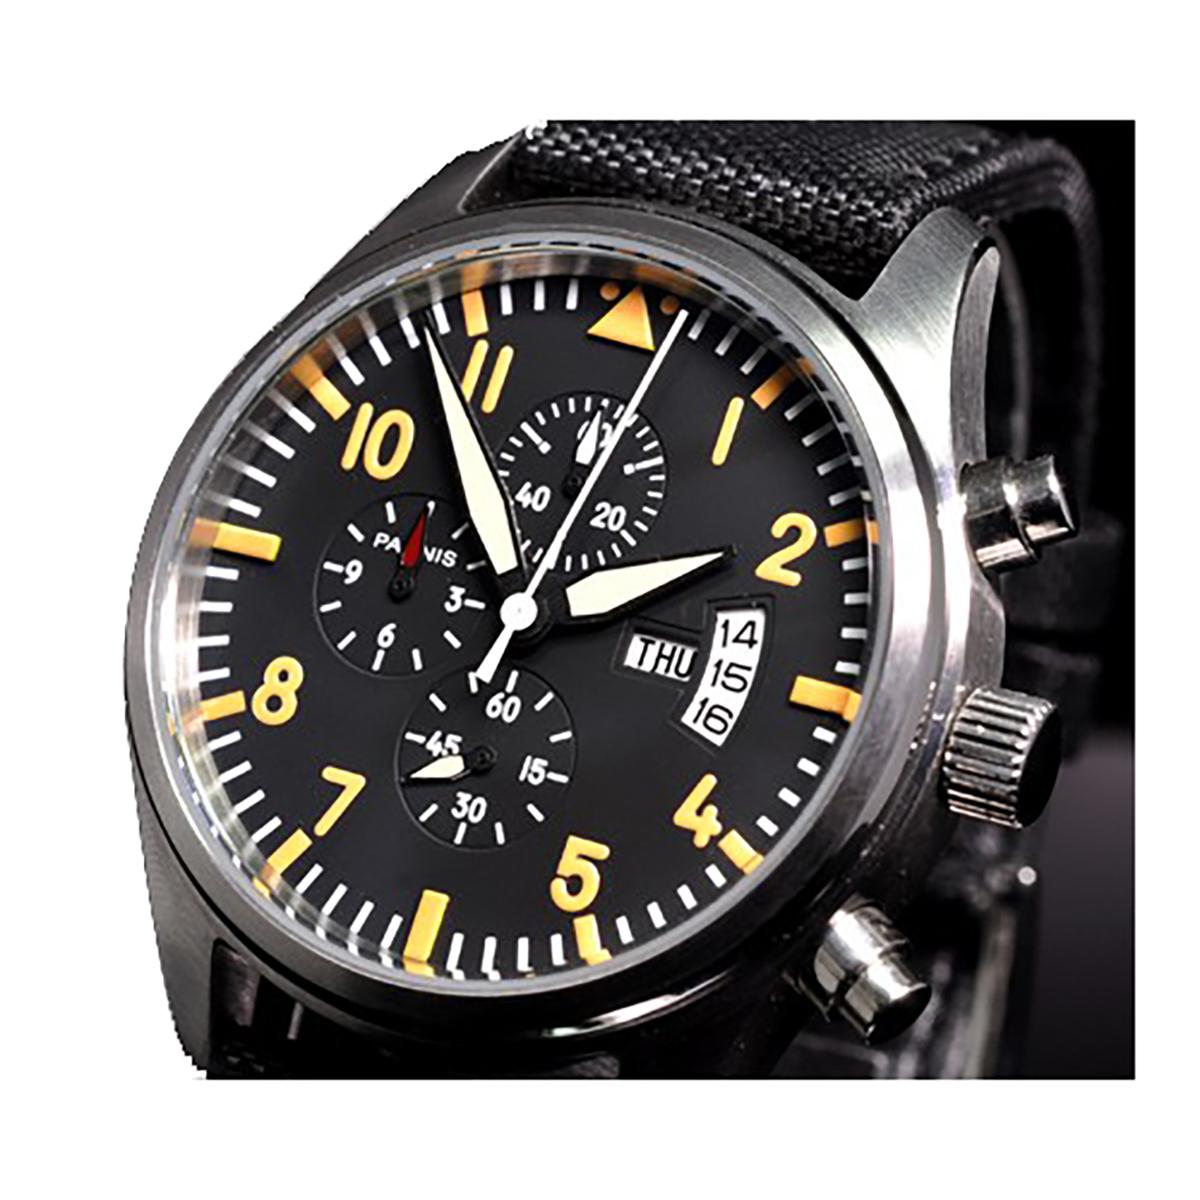 PARNIS パーニス クォーツ 腕時計 メンズ [PN-042B] 並行輸入品 当店保証24ヵ月